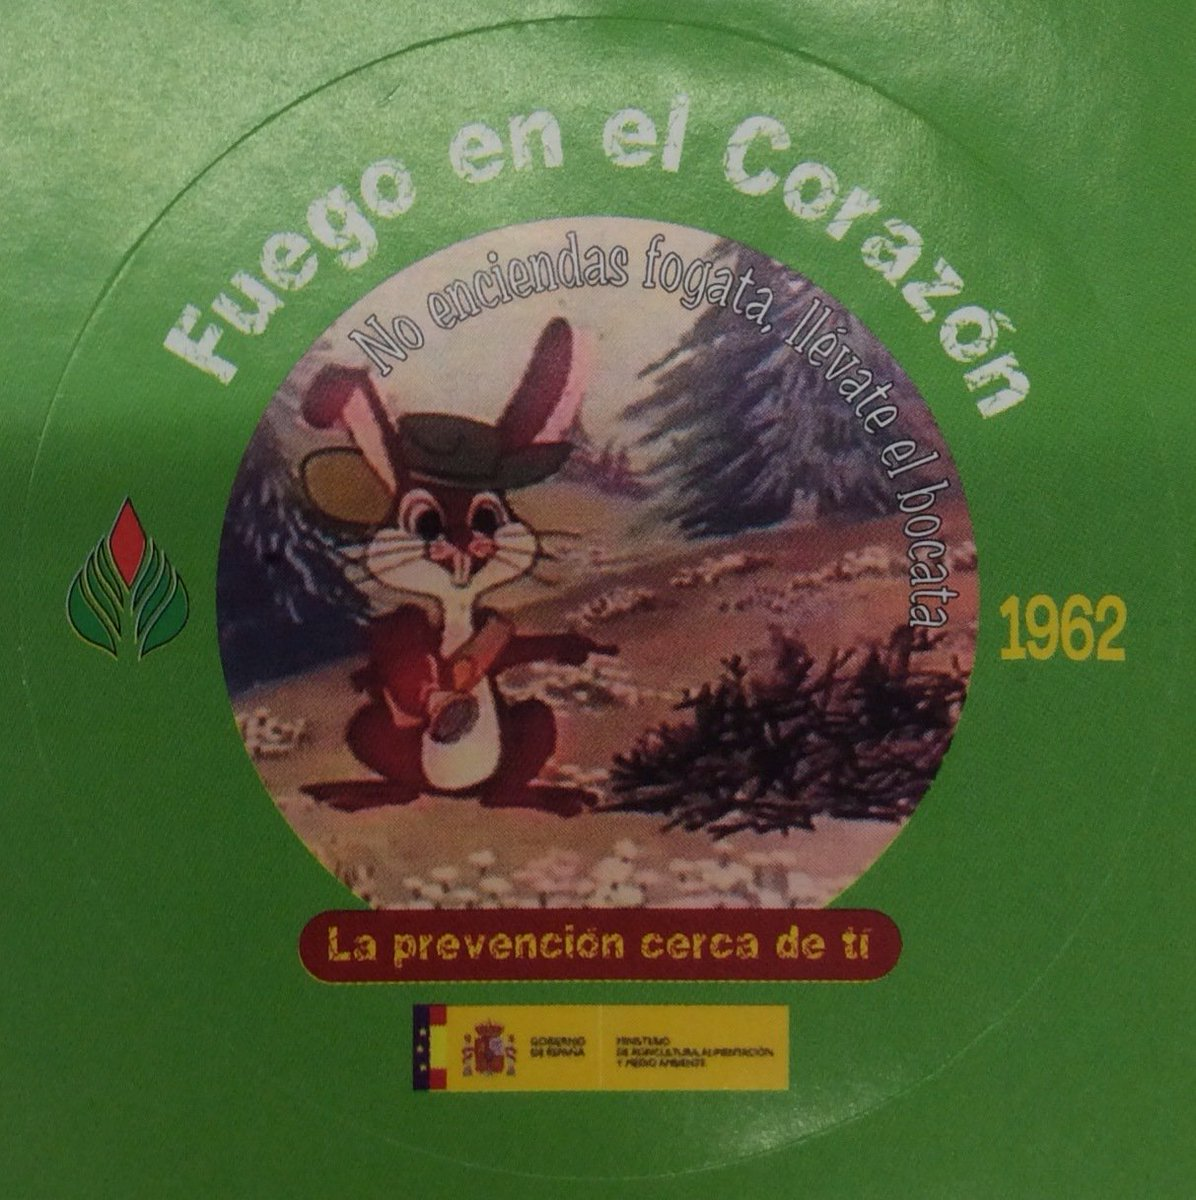 🔥 🔥 🔥 Ya lo decía Fidel en 1962... No enciendas fogata, llévate el boc...